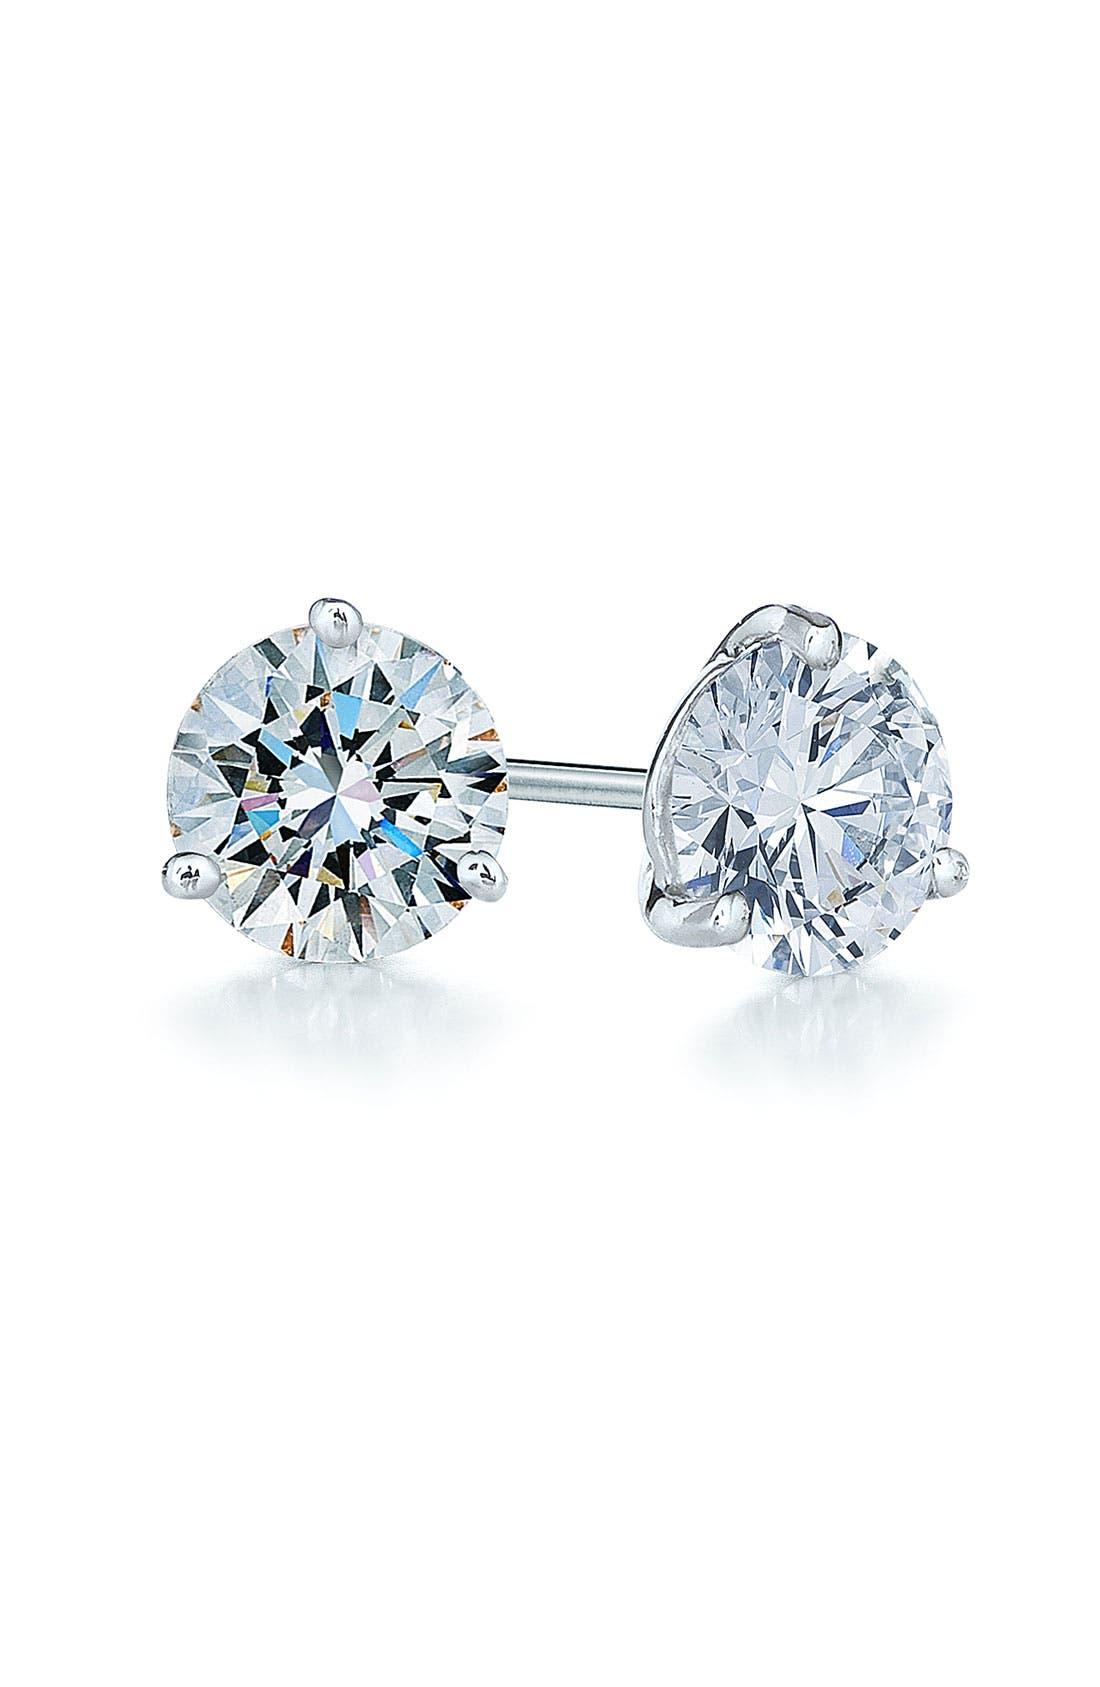 1.25ct tw Diamond & Platinum Stud Earrings,                             Main thumbnail 1, color,                             PLATINUM